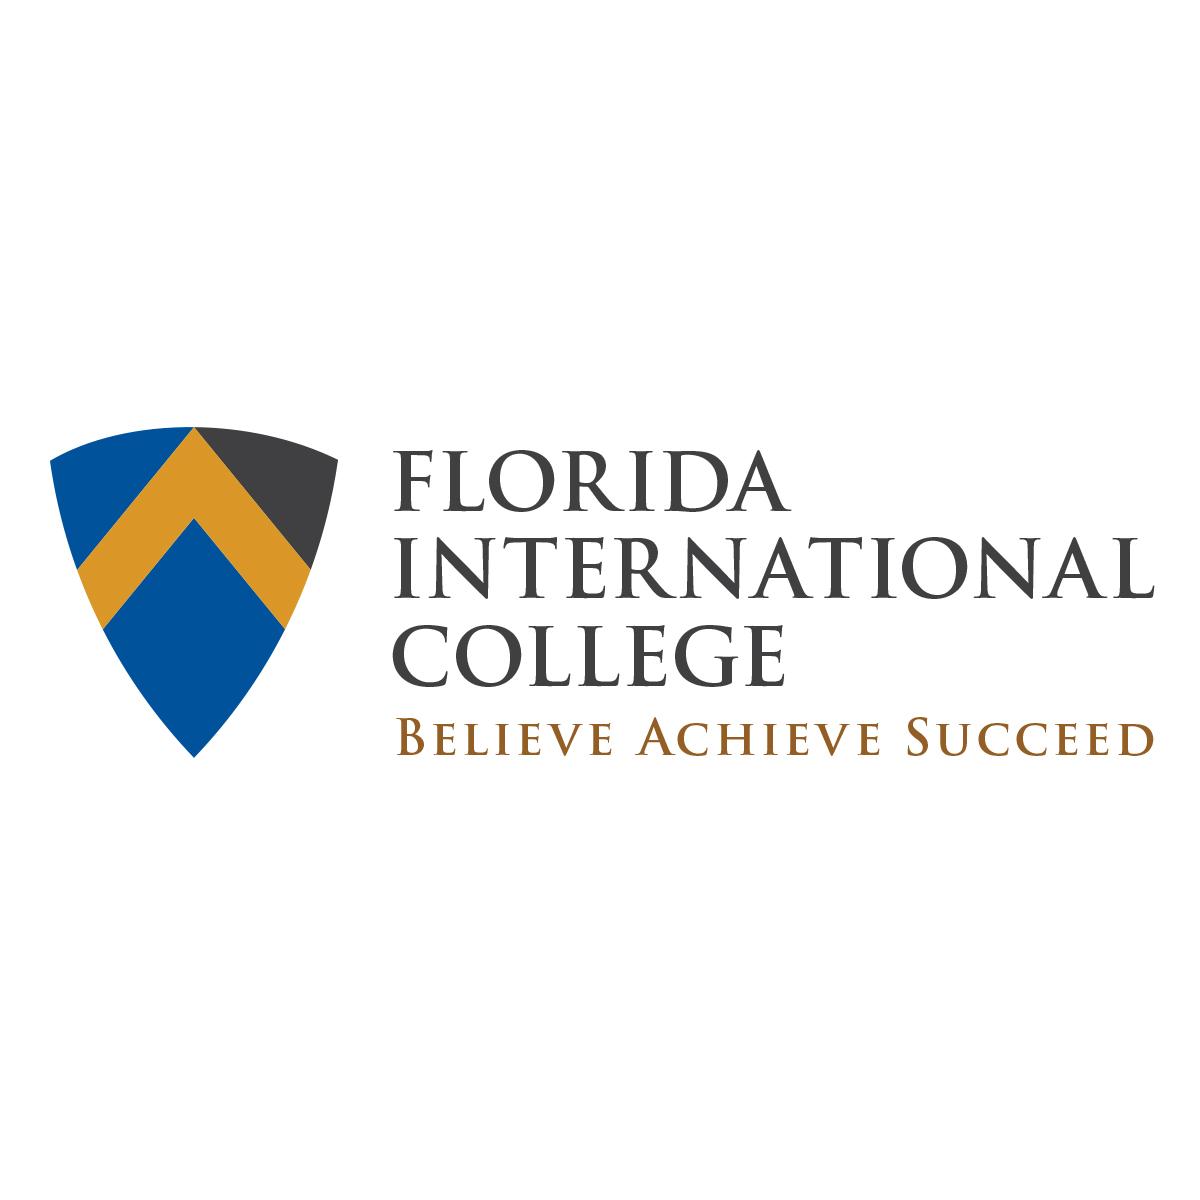 Florida International College